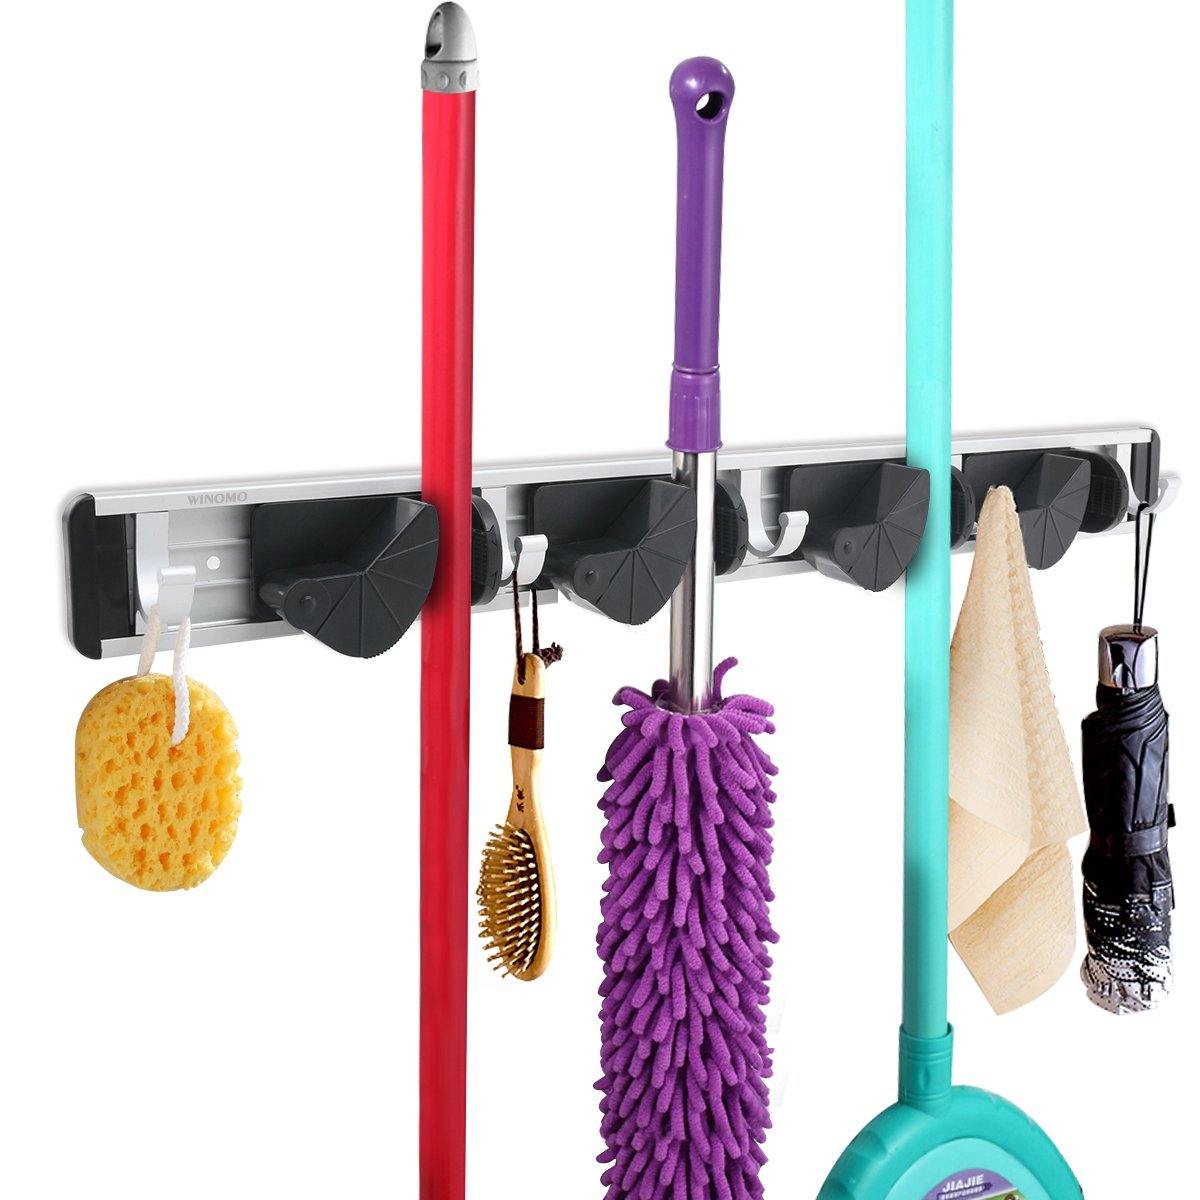 WINOMO Broom Mop Holder Organizer Garage Storage Hooks Wall Mounted 4 Position 5 Hooks for Shelving Ideas